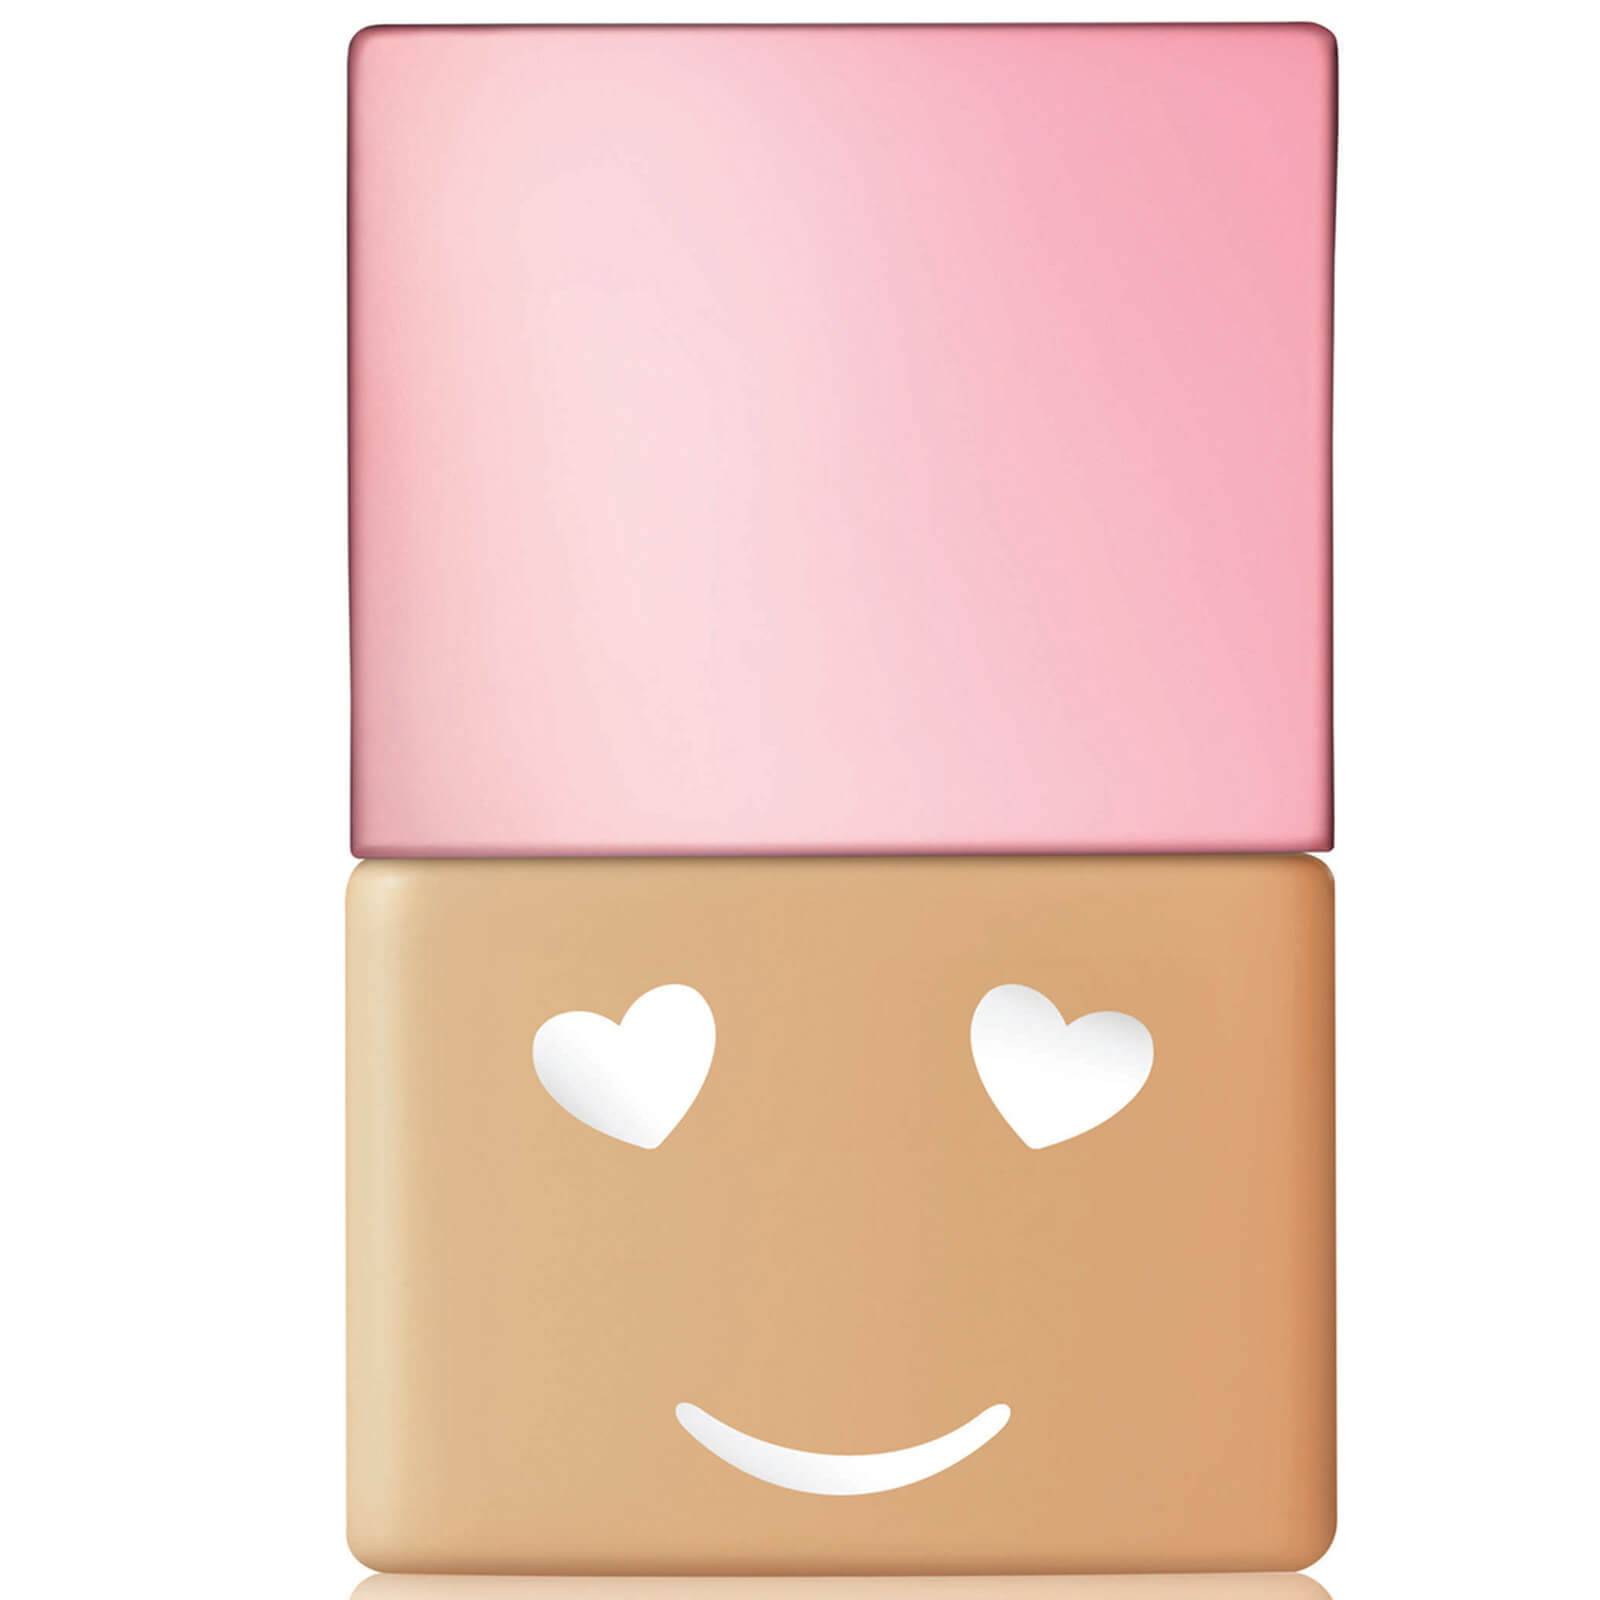 Benefit Hello Happy Soft Blur Foundation Mini (Various Shades) - 06